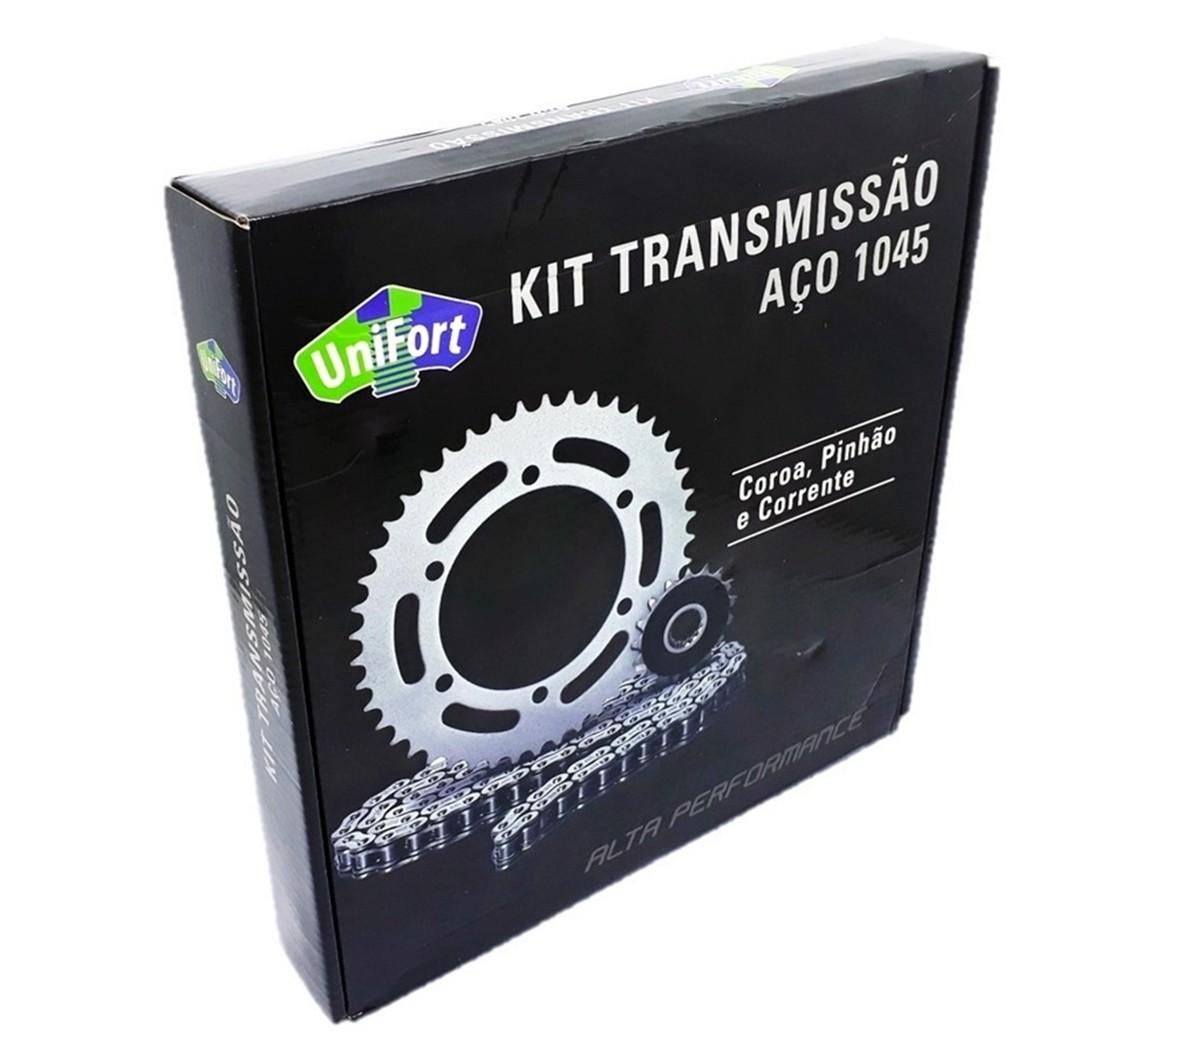 Kit Relação Factor 150 Aço 1045 Unifort 428x118x39x14